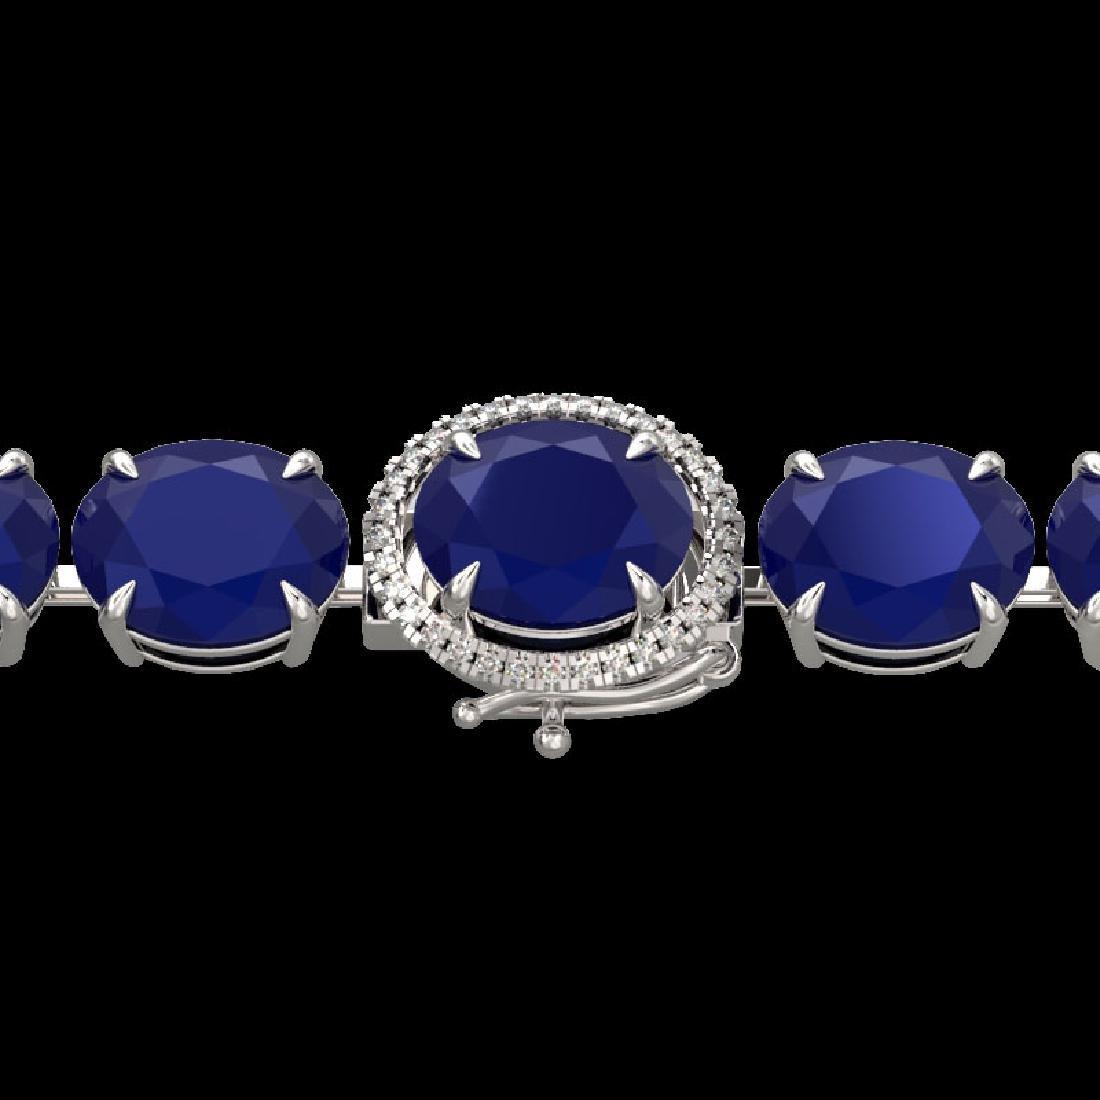 76 CTW Sapphire & Micro Pave VS/SI Diamond Halo